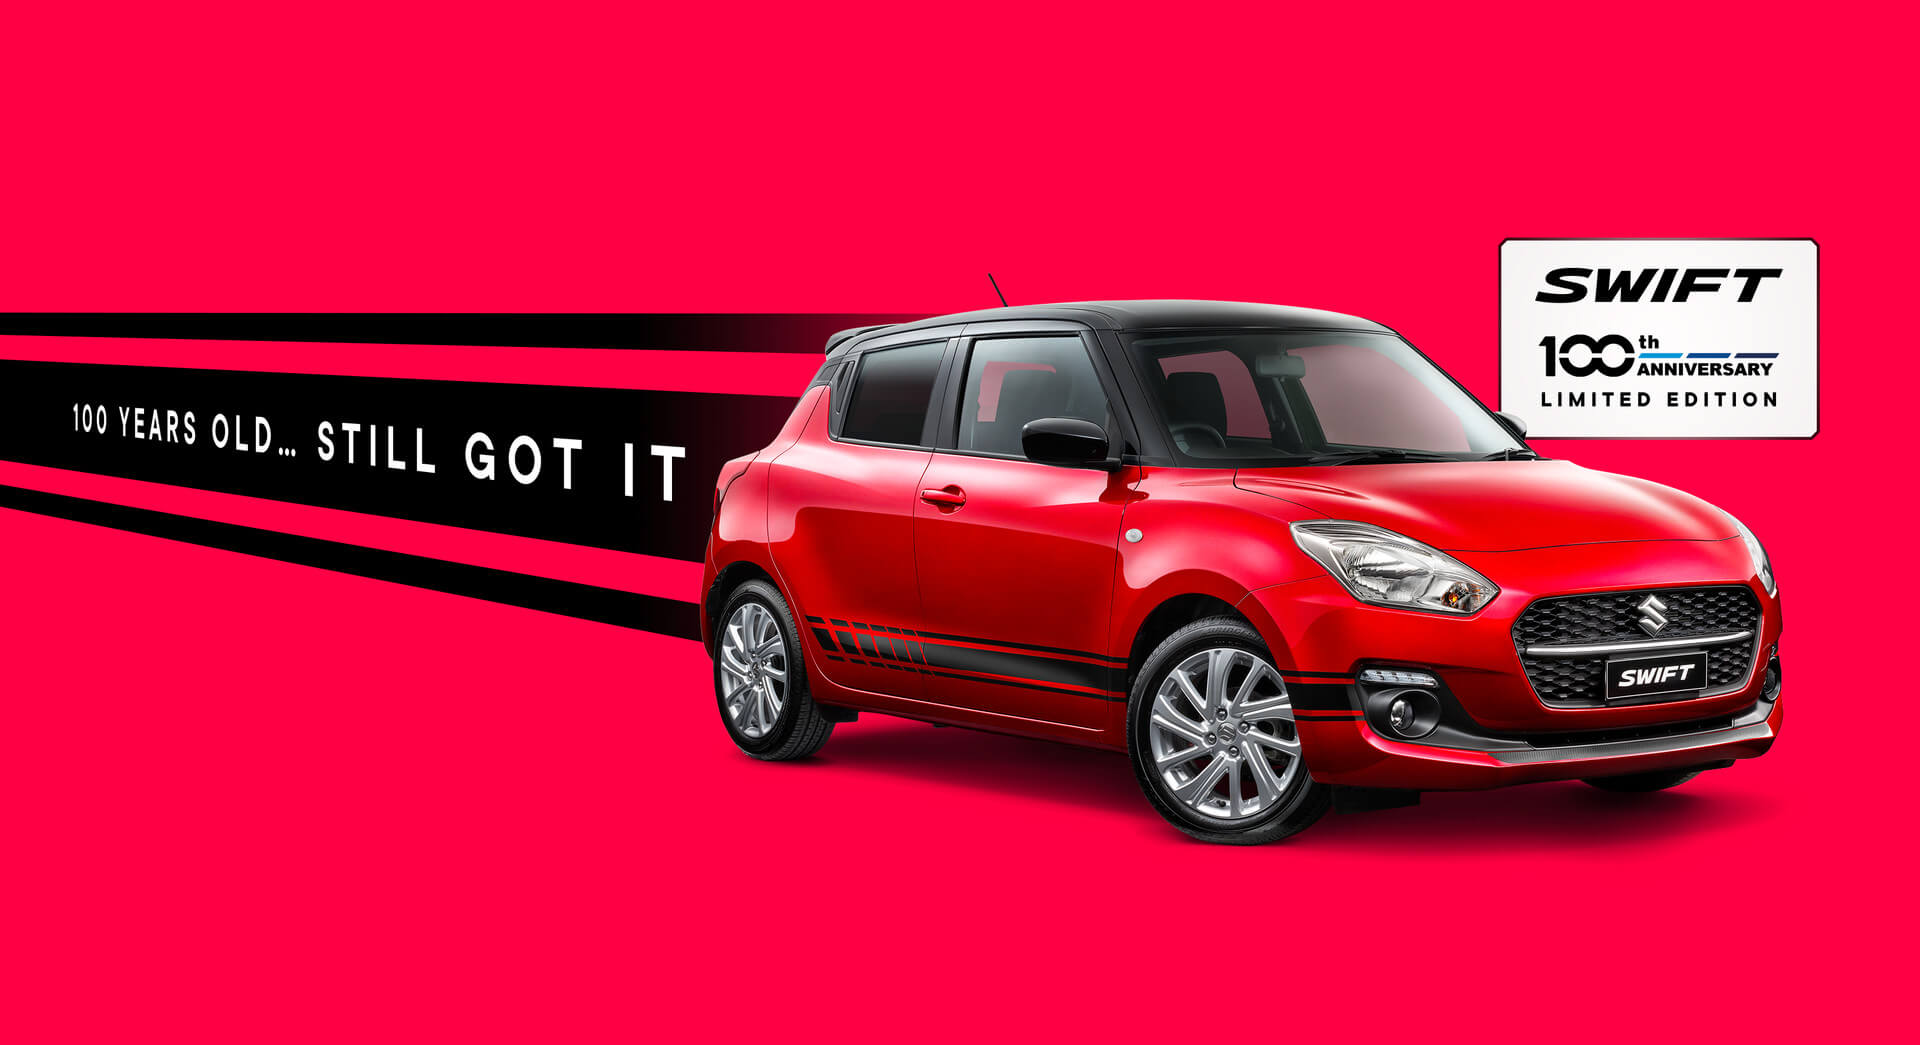 Suzuki Swift 100th Anniversary Limited Edition